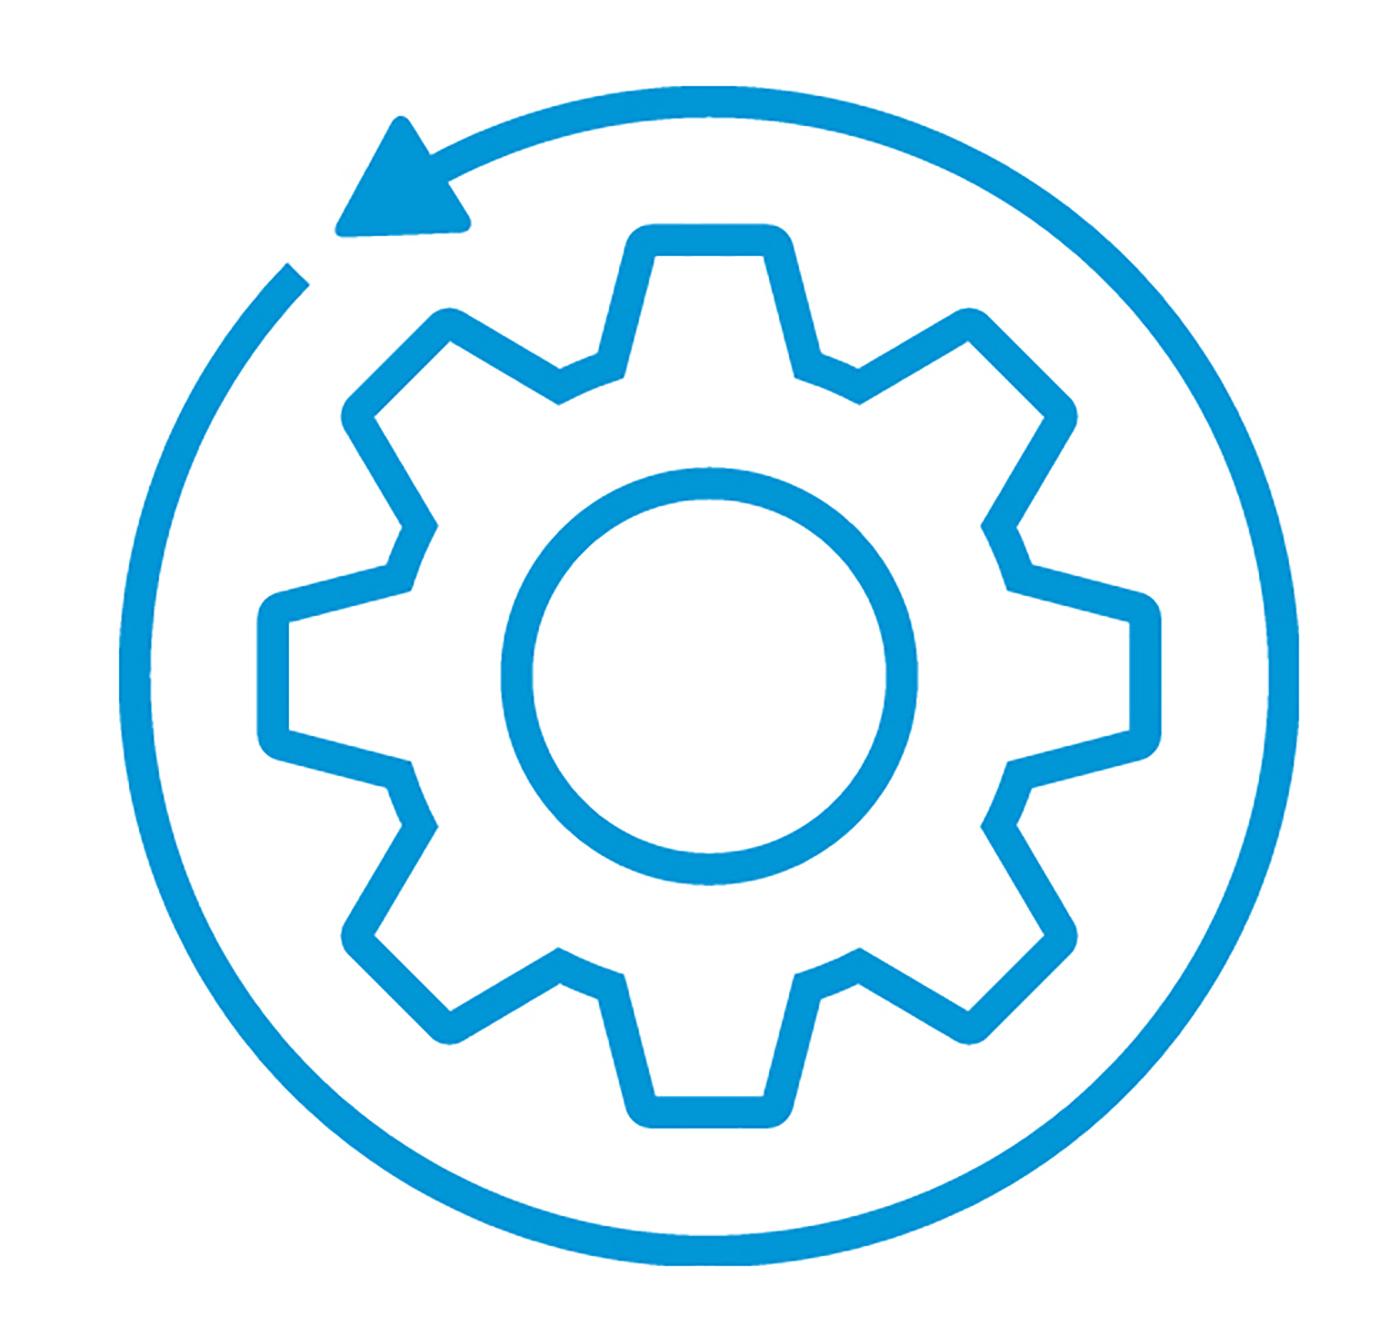 HP 3y DaaS Proactive Management Premium Service